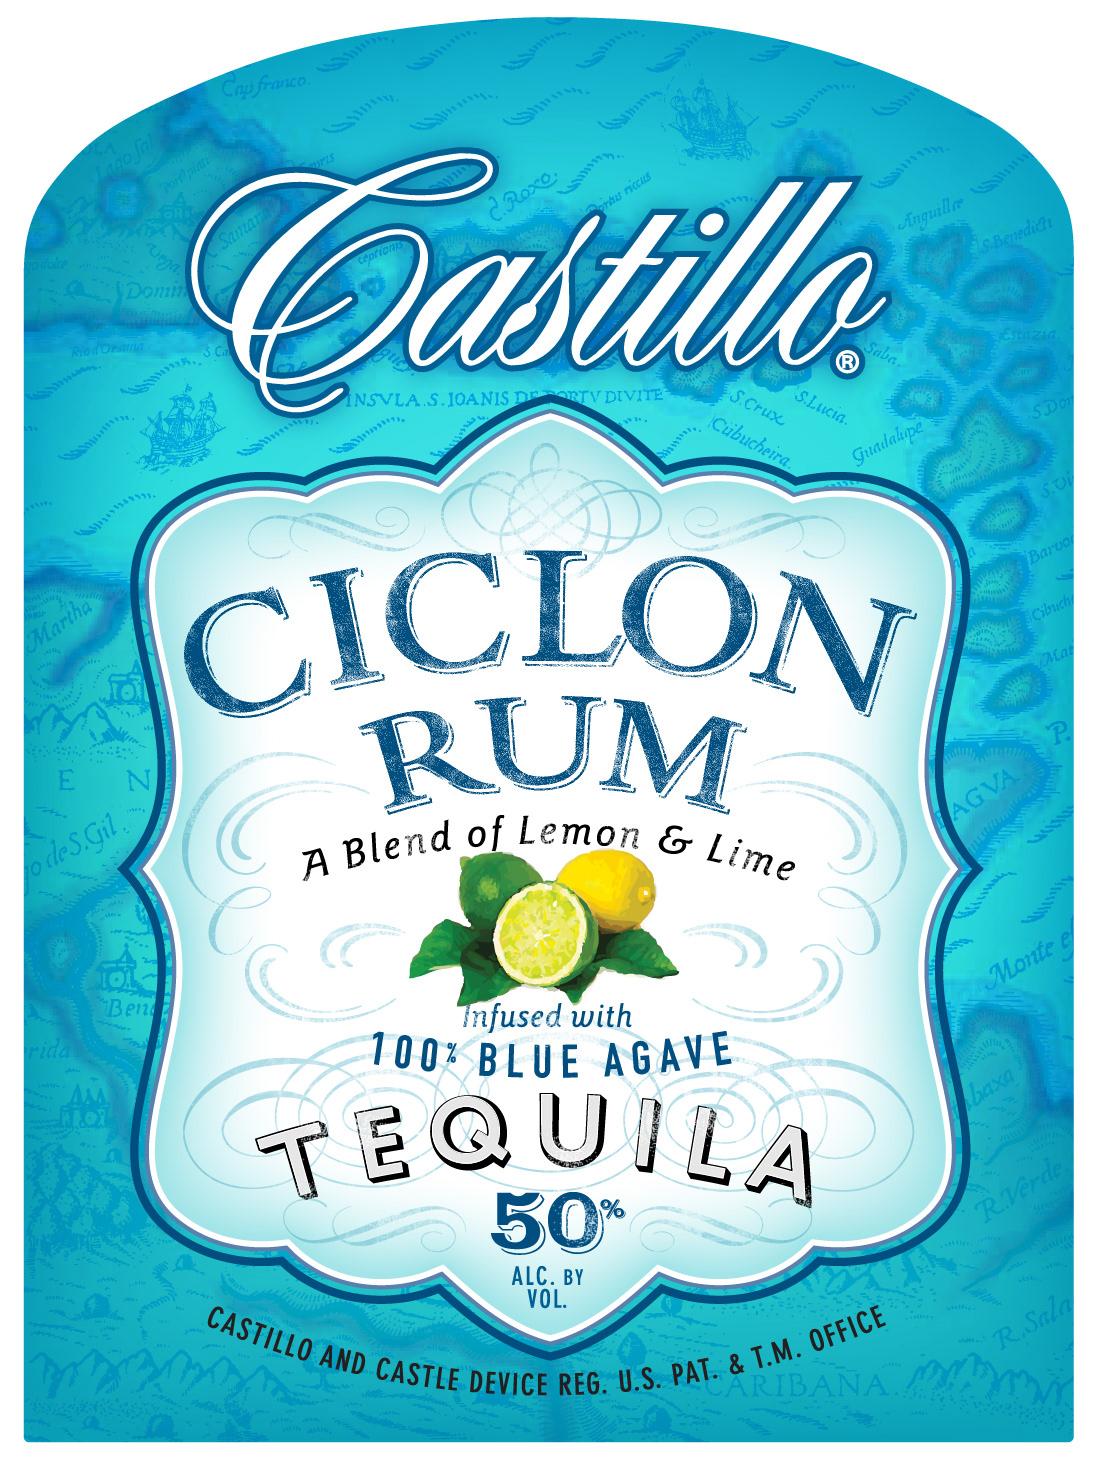 Rum bacardi  label Spirits alcohol colorful drink Retro graphics art vintage package design  dallas texas dan birlew